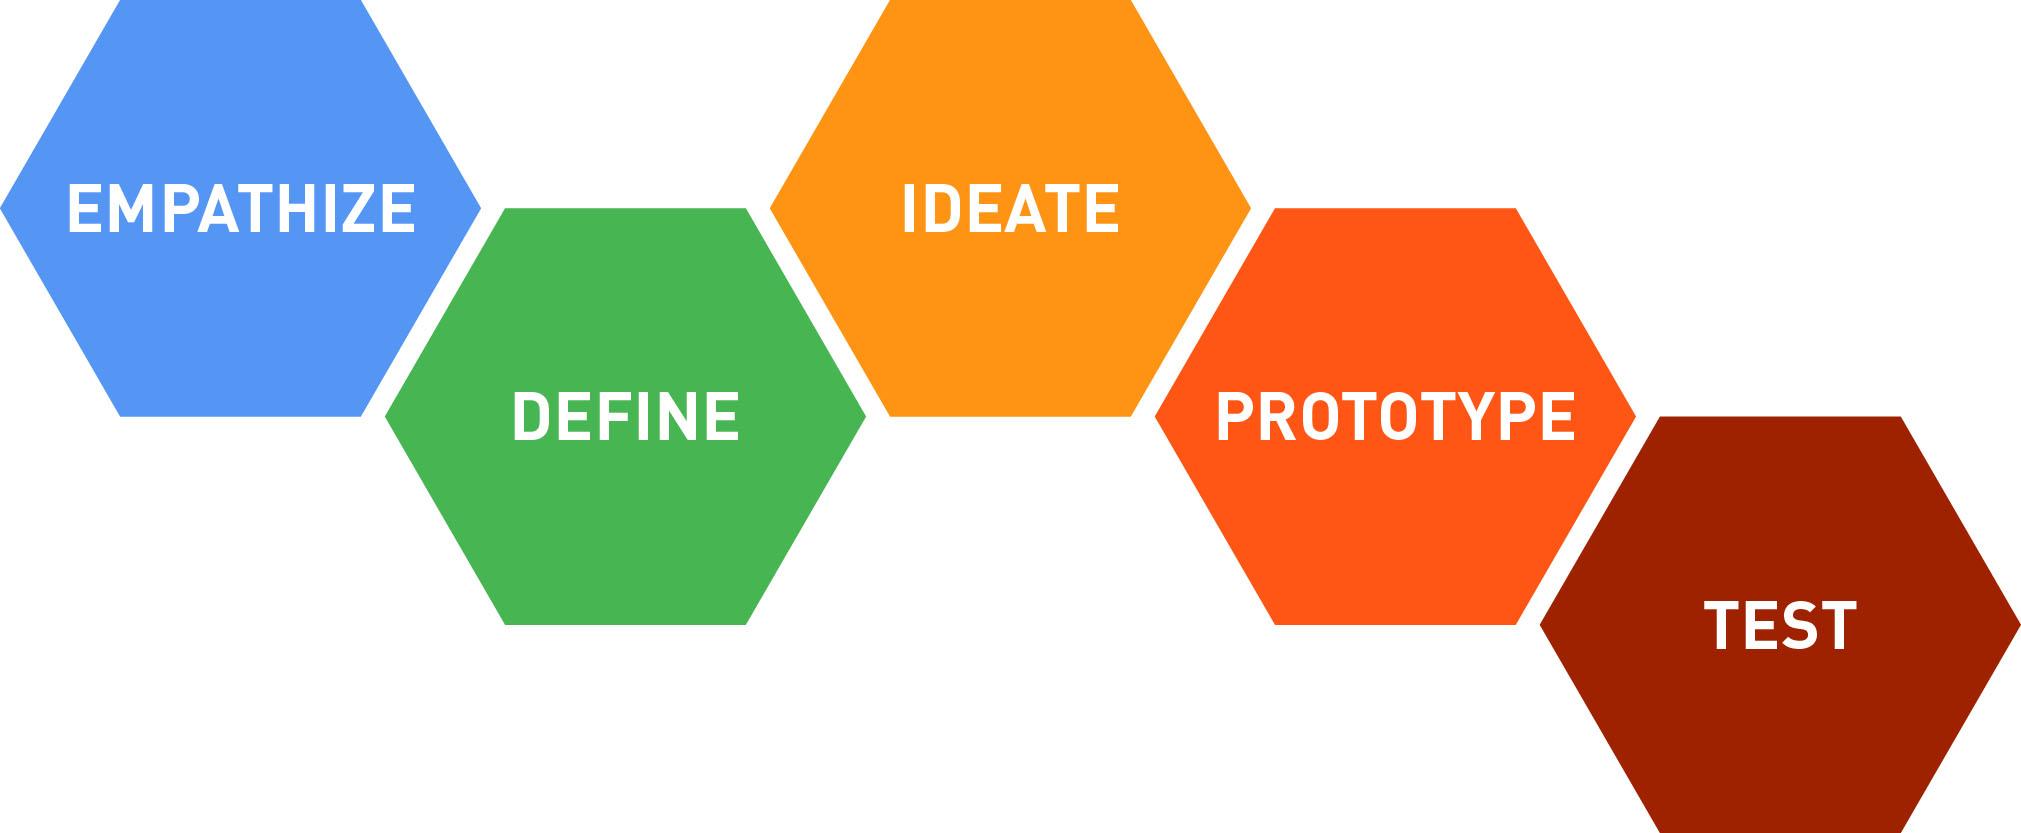 design_thinking_process_diagram - Test.jpg